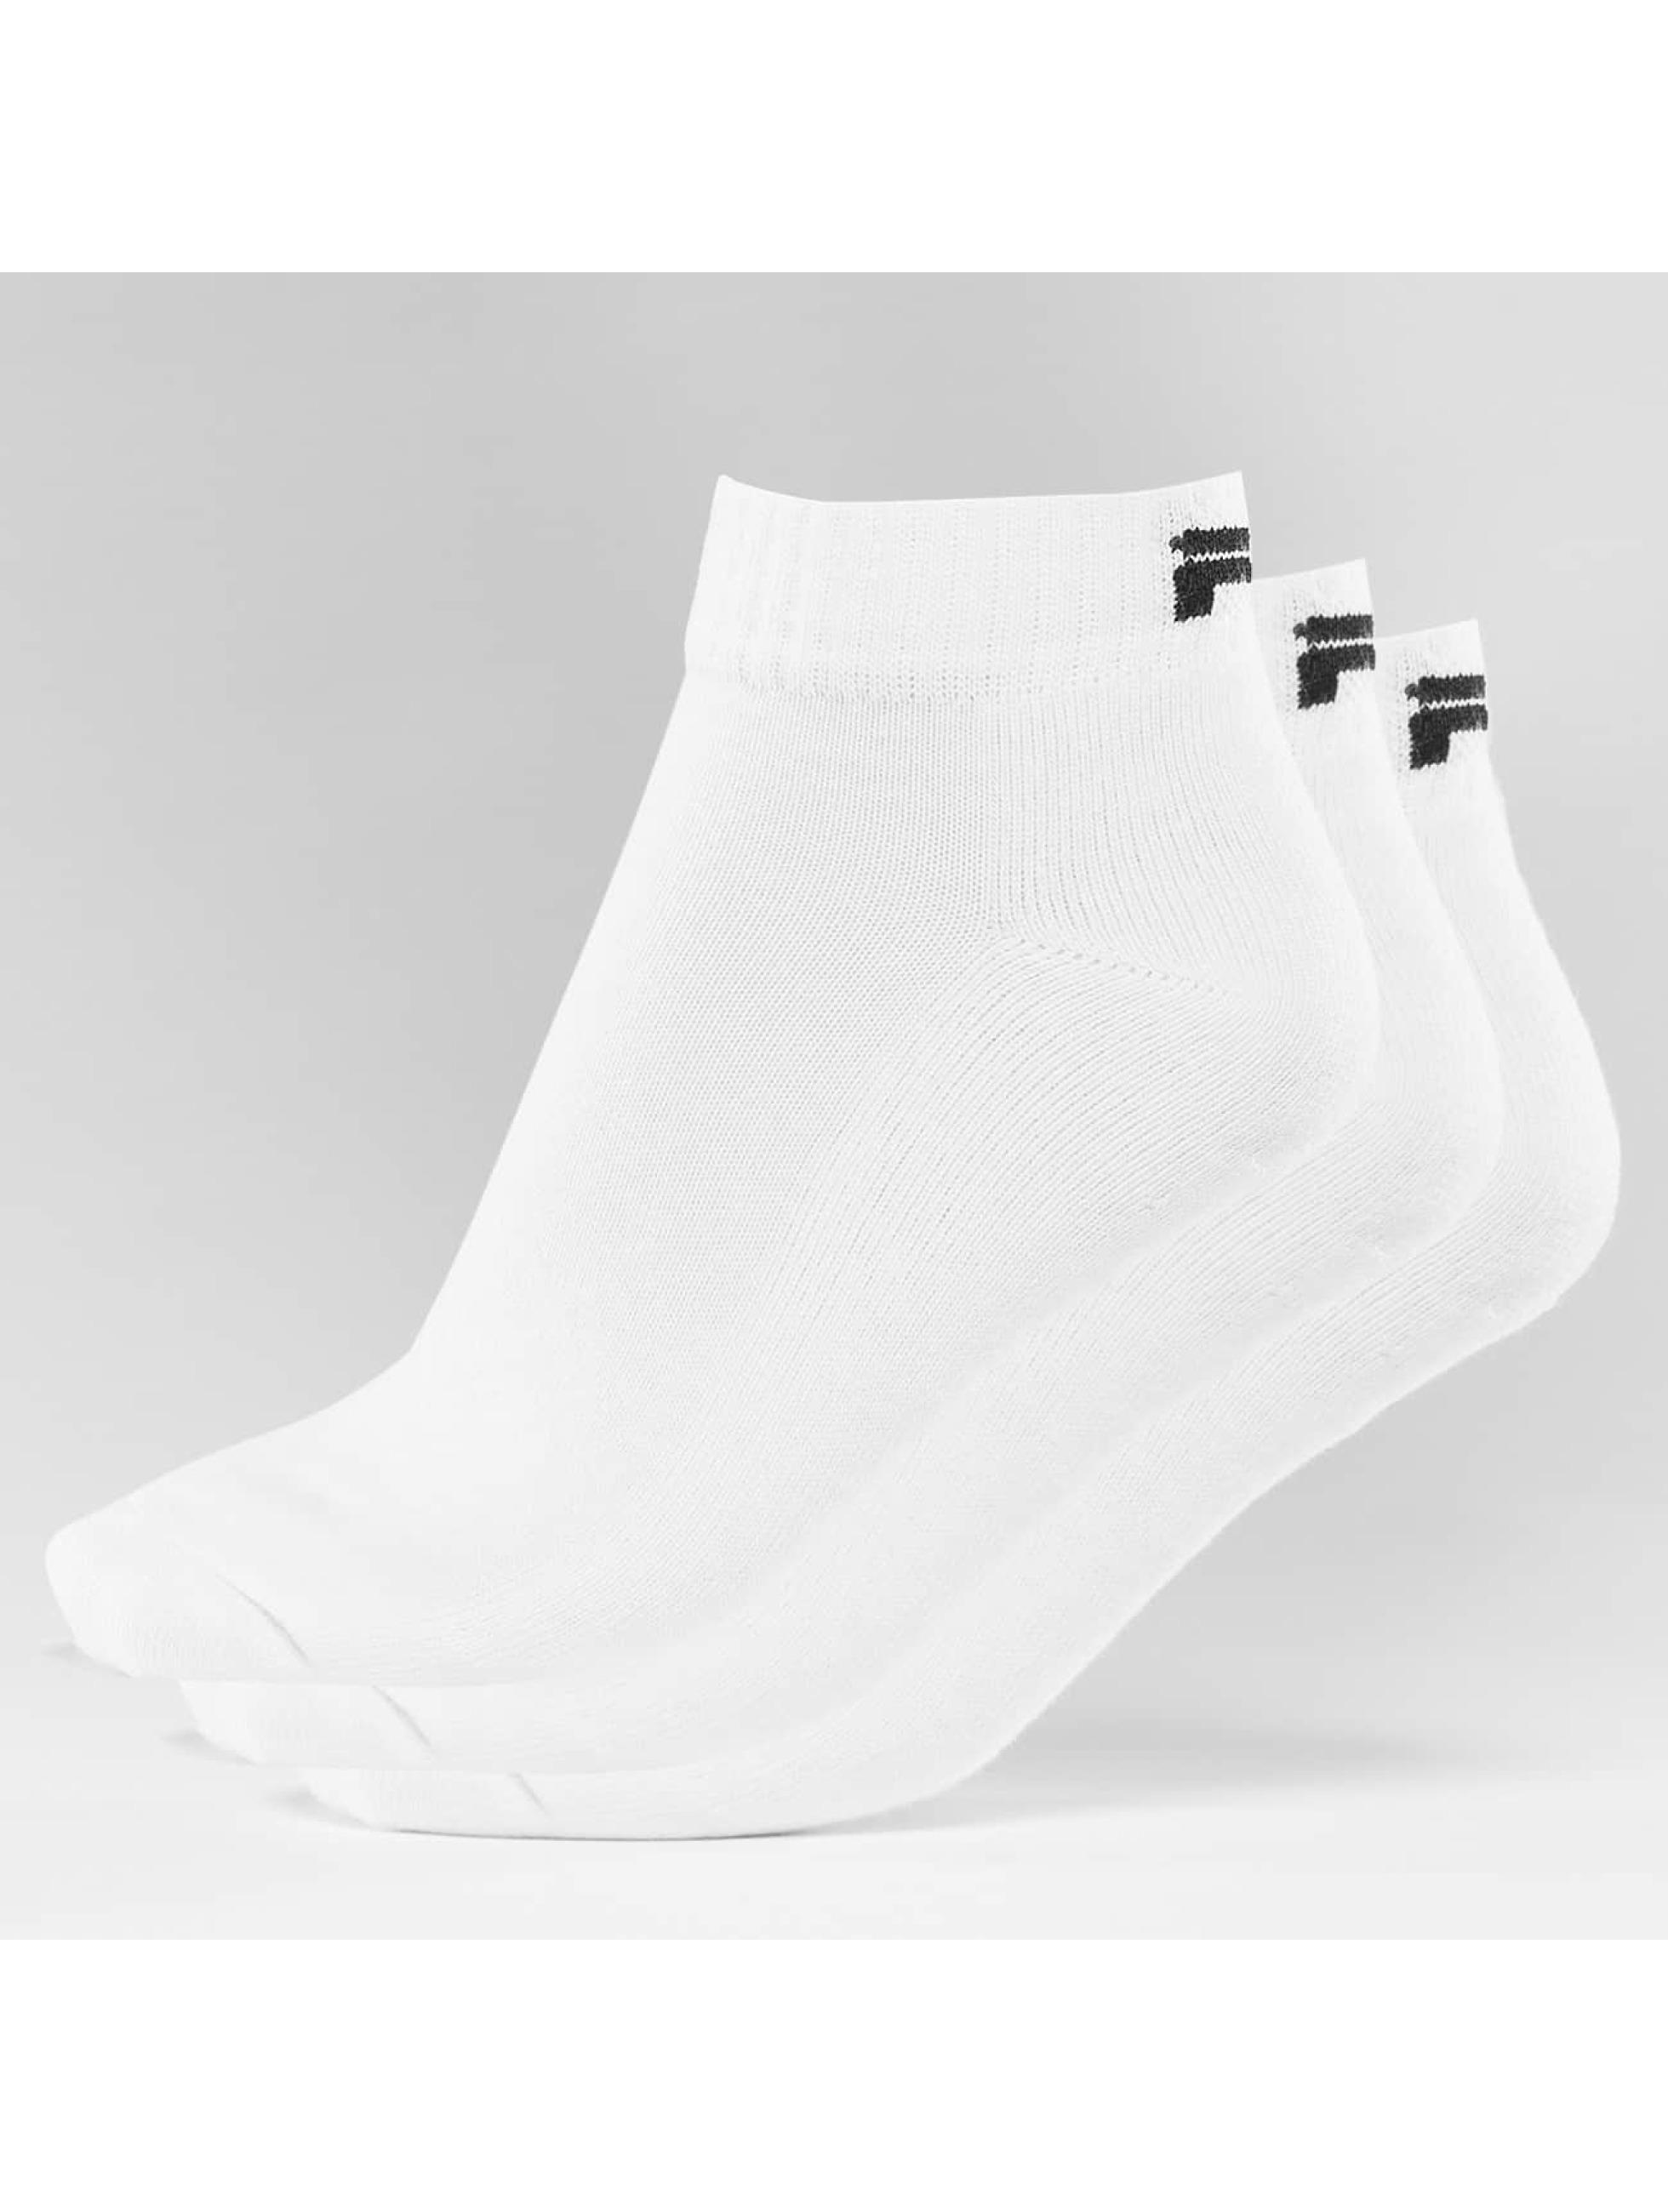 FILA Calzino 3-Pack bianco